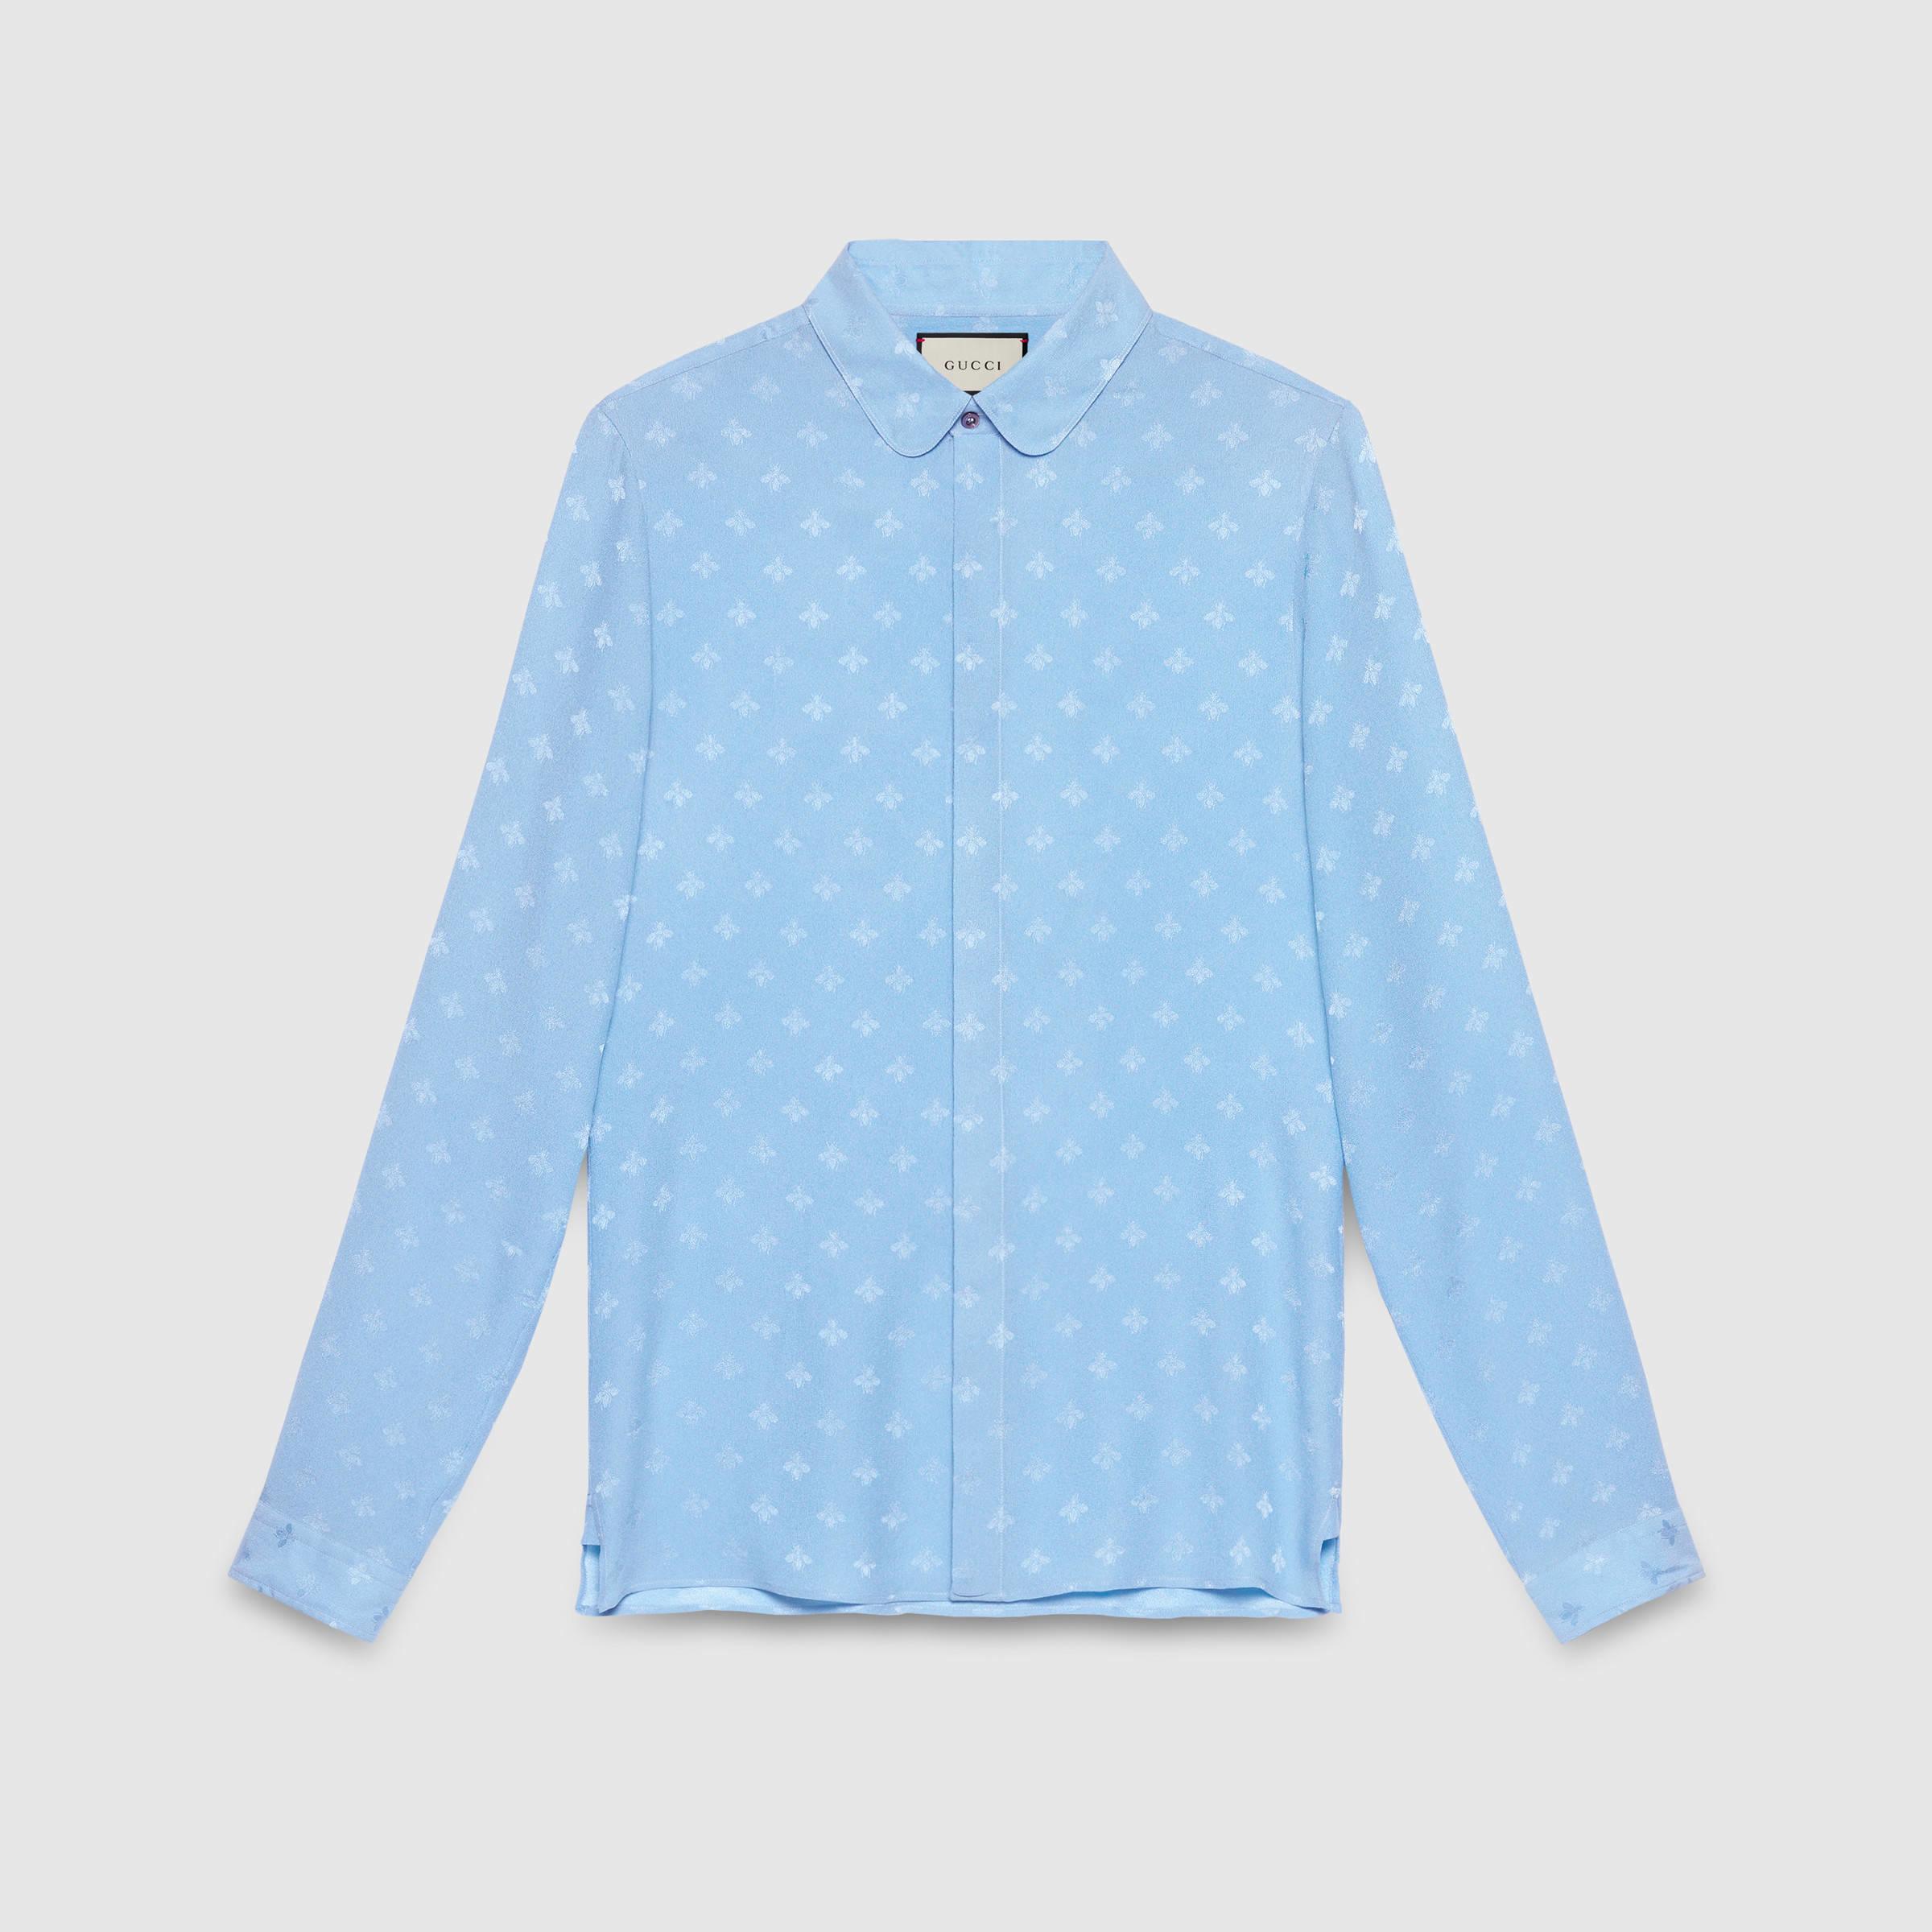 d946d2b2 Gucci Bee Jacquard Cambridge Shirt in Blue for Men - Lyst